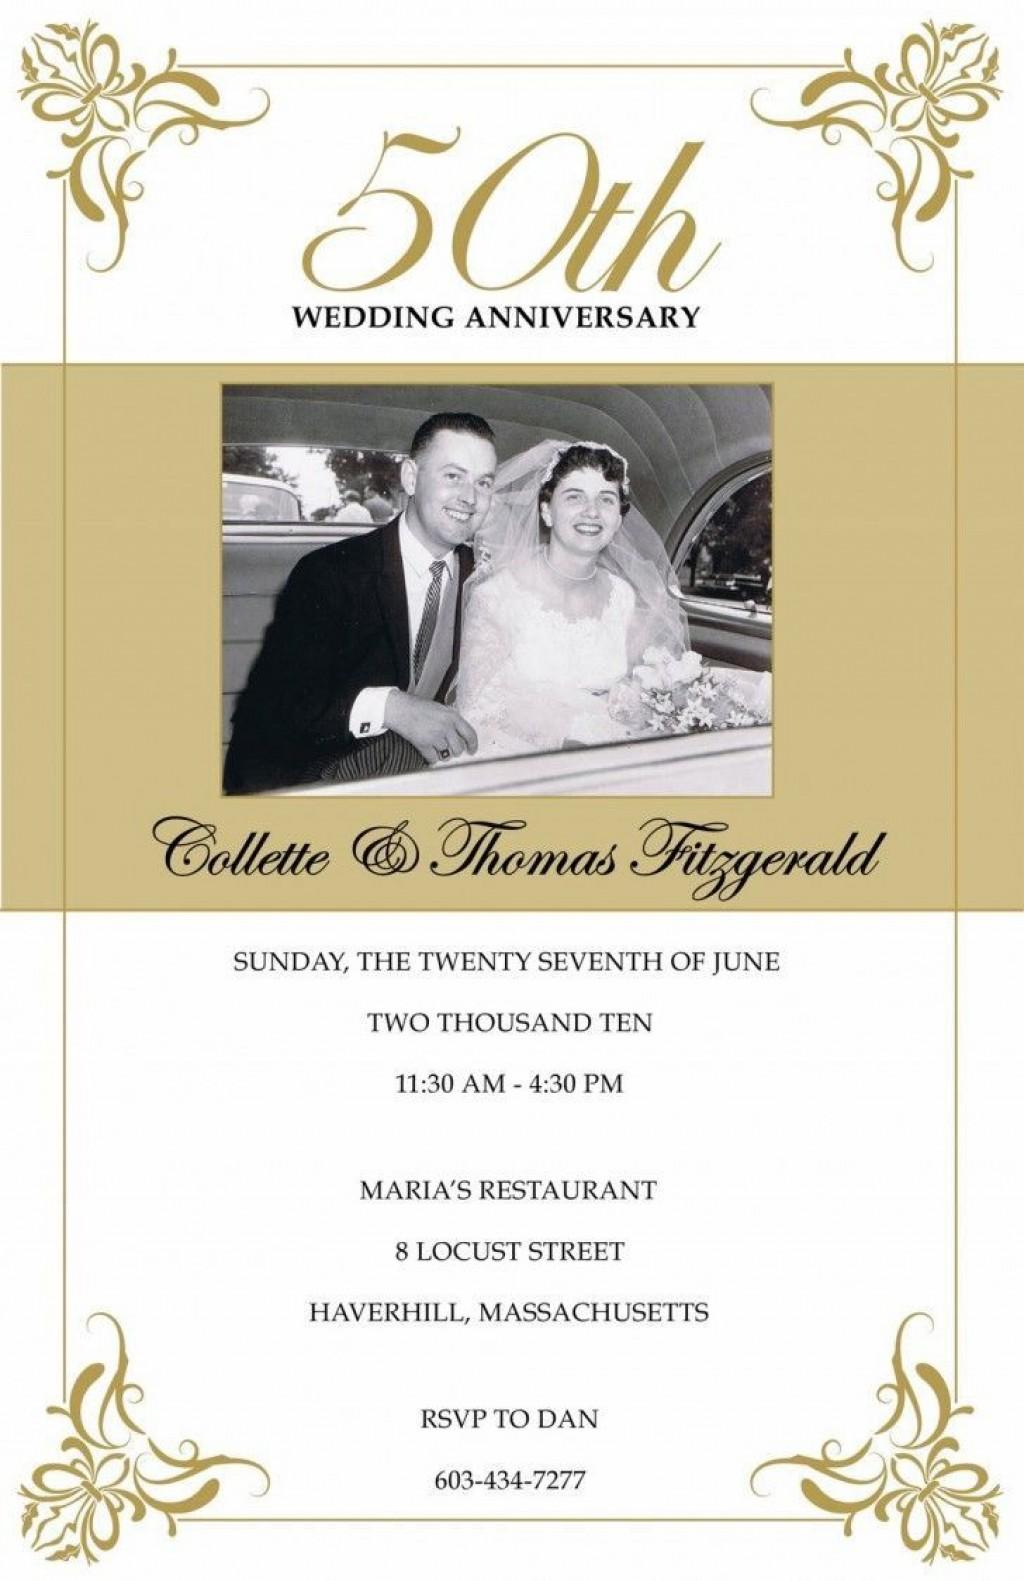 009 Breathtaking 50th Anniversary Invitation Template High Resolution  Wedding Microsoft Word Free DownloadLarge